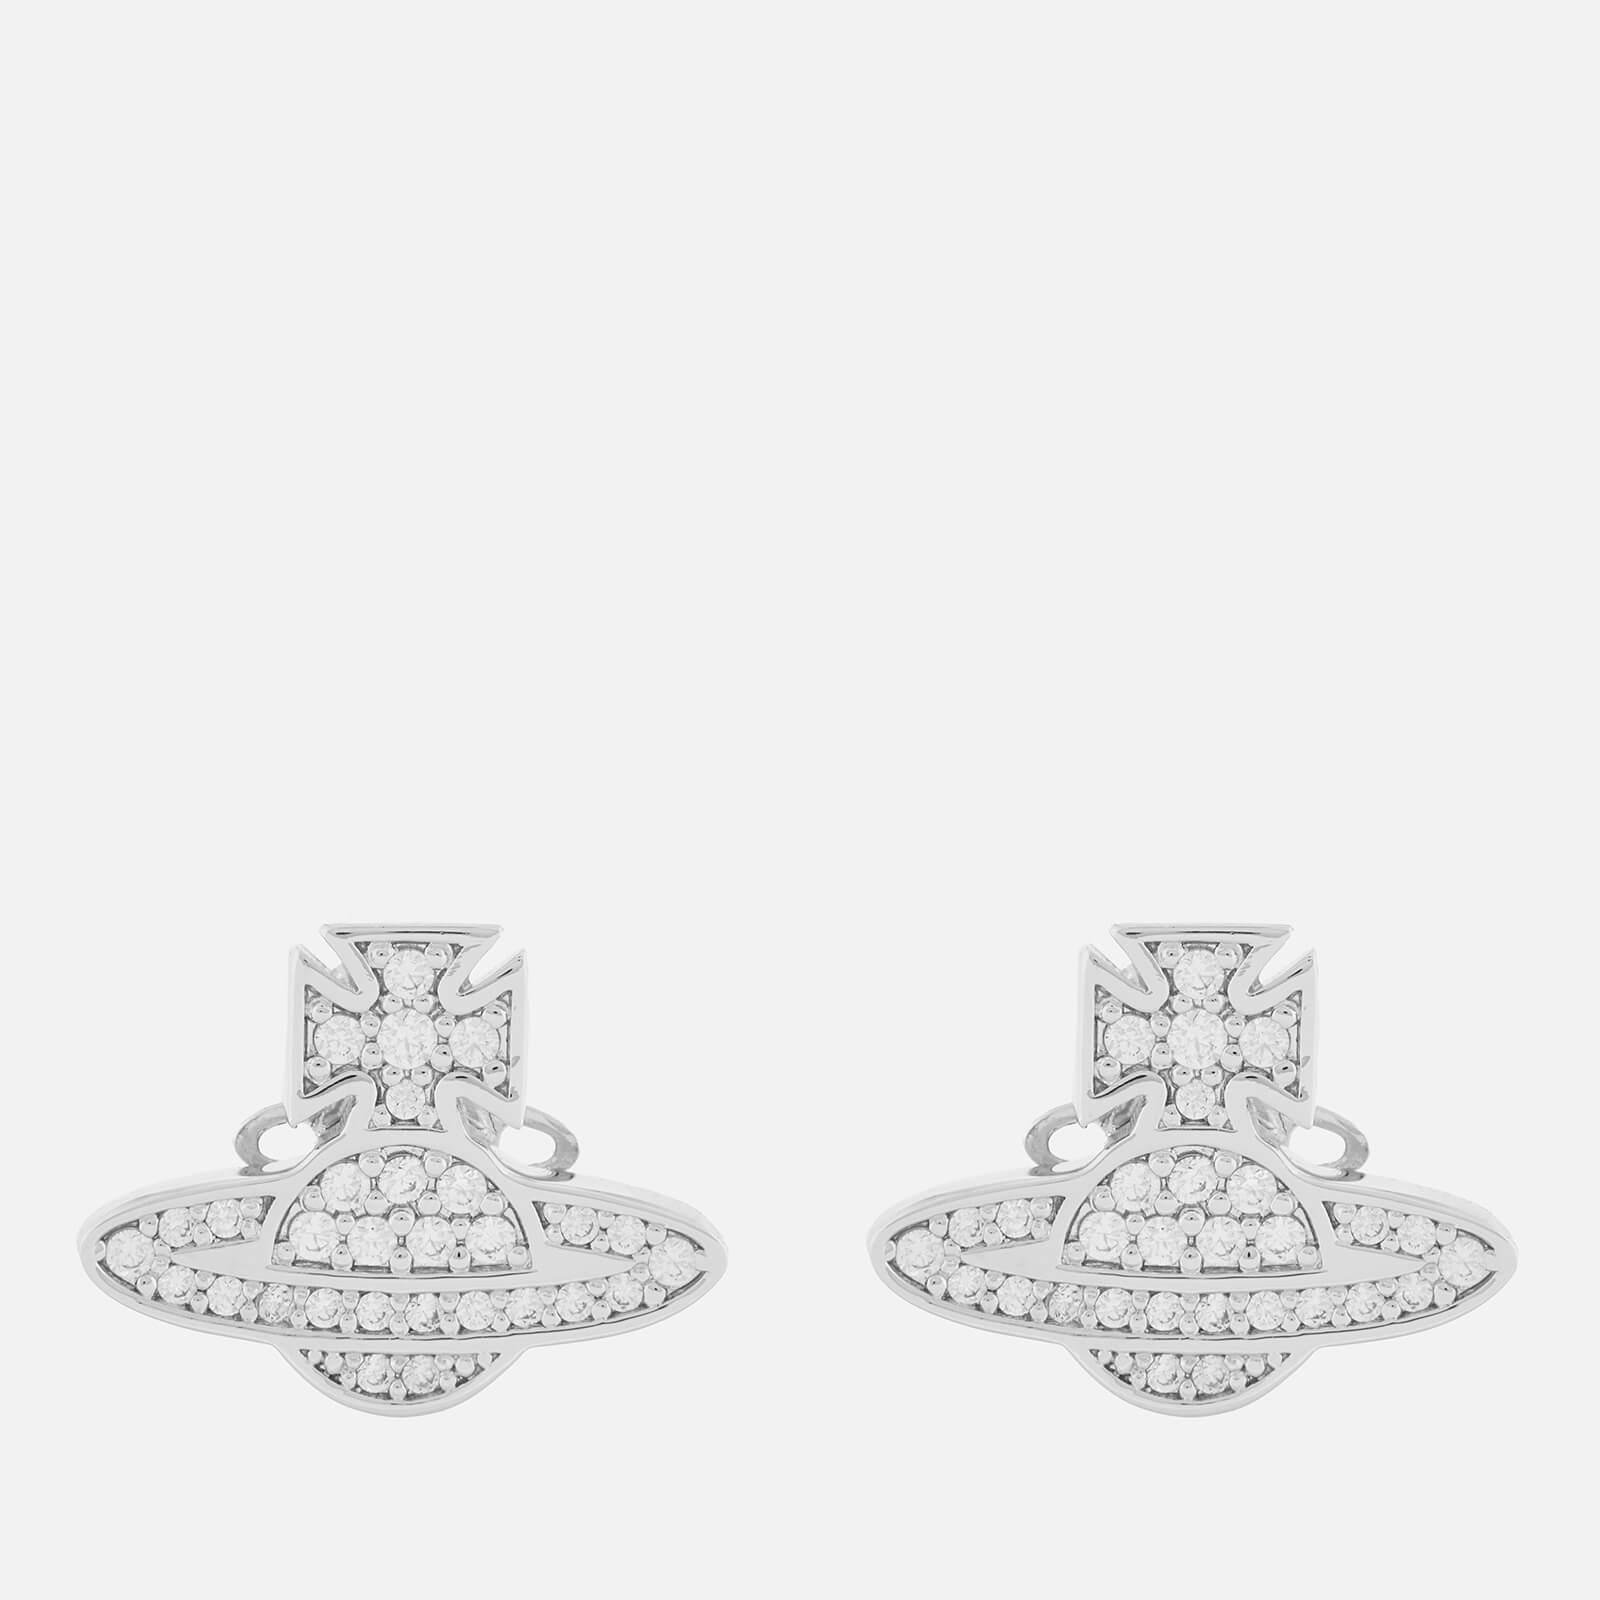 Vivienne Westwood Women's Romina Pave Orb Earrings - Rhodium White